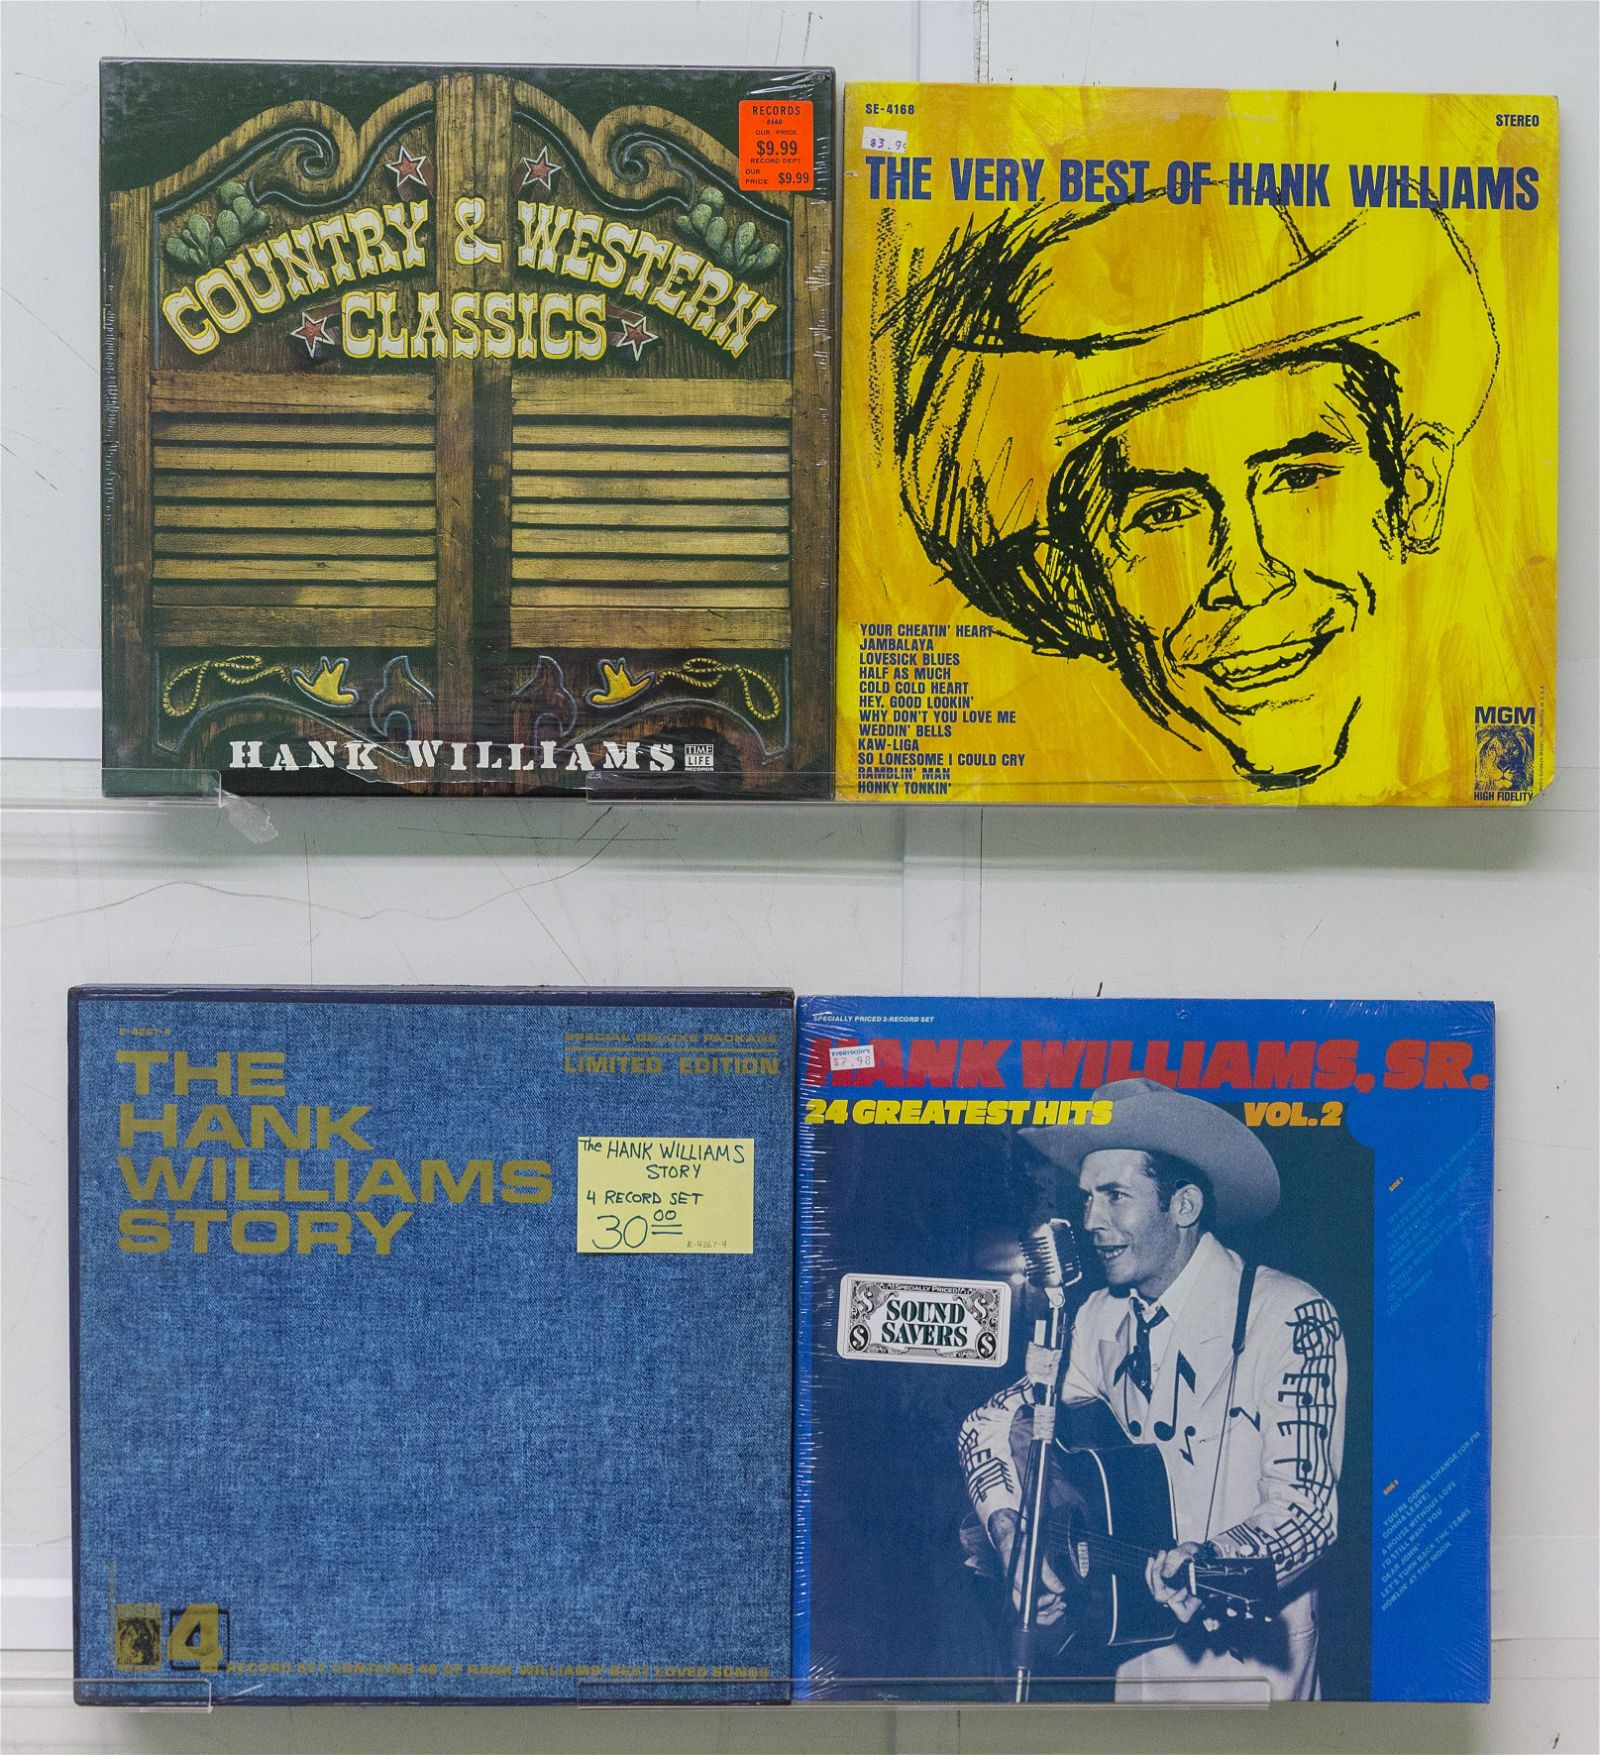 3 Hank William Vinyl Records & 1 Box Set